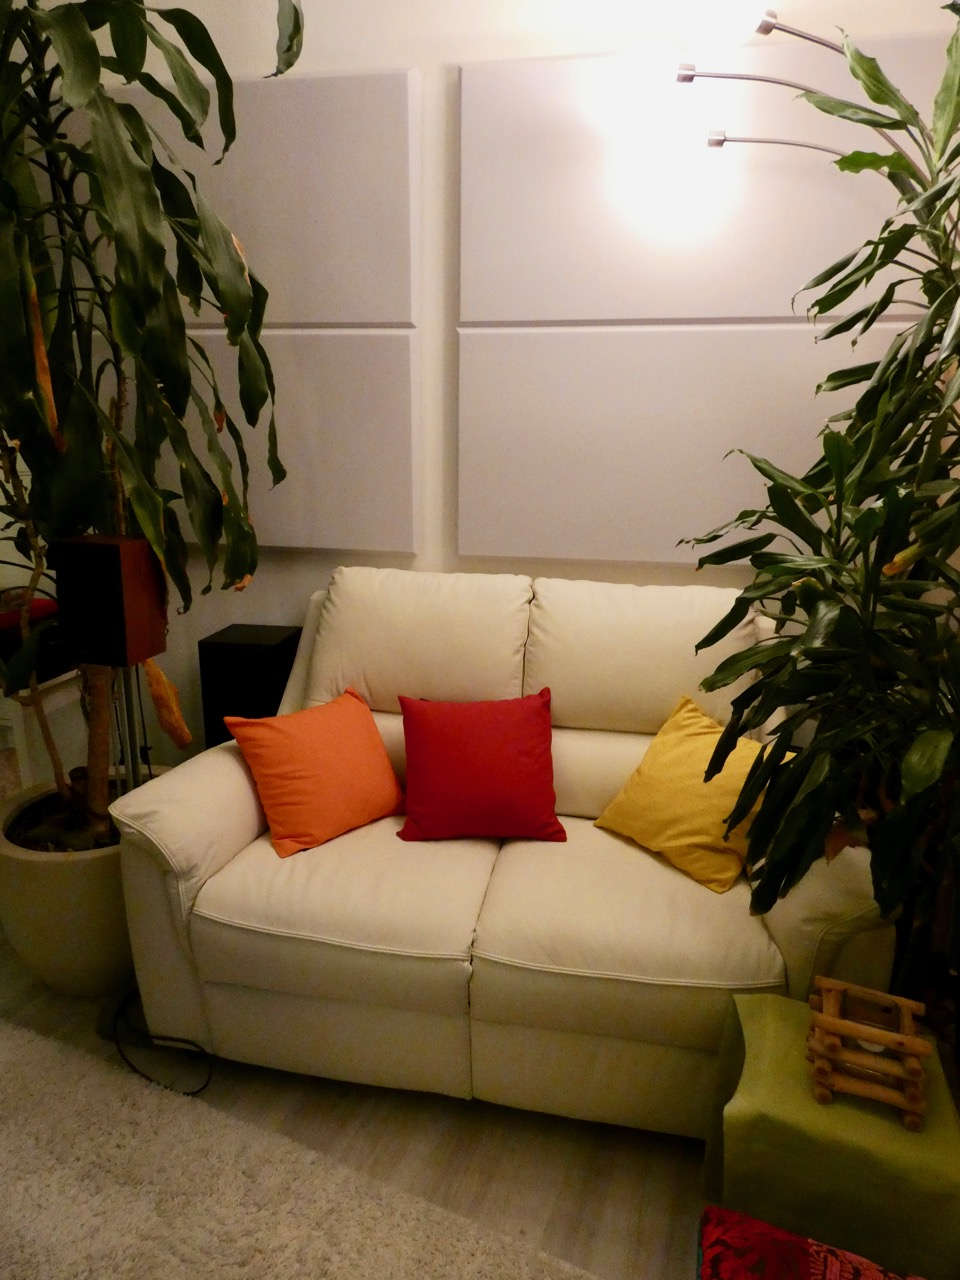 fabiton & filmproduktion/Couch